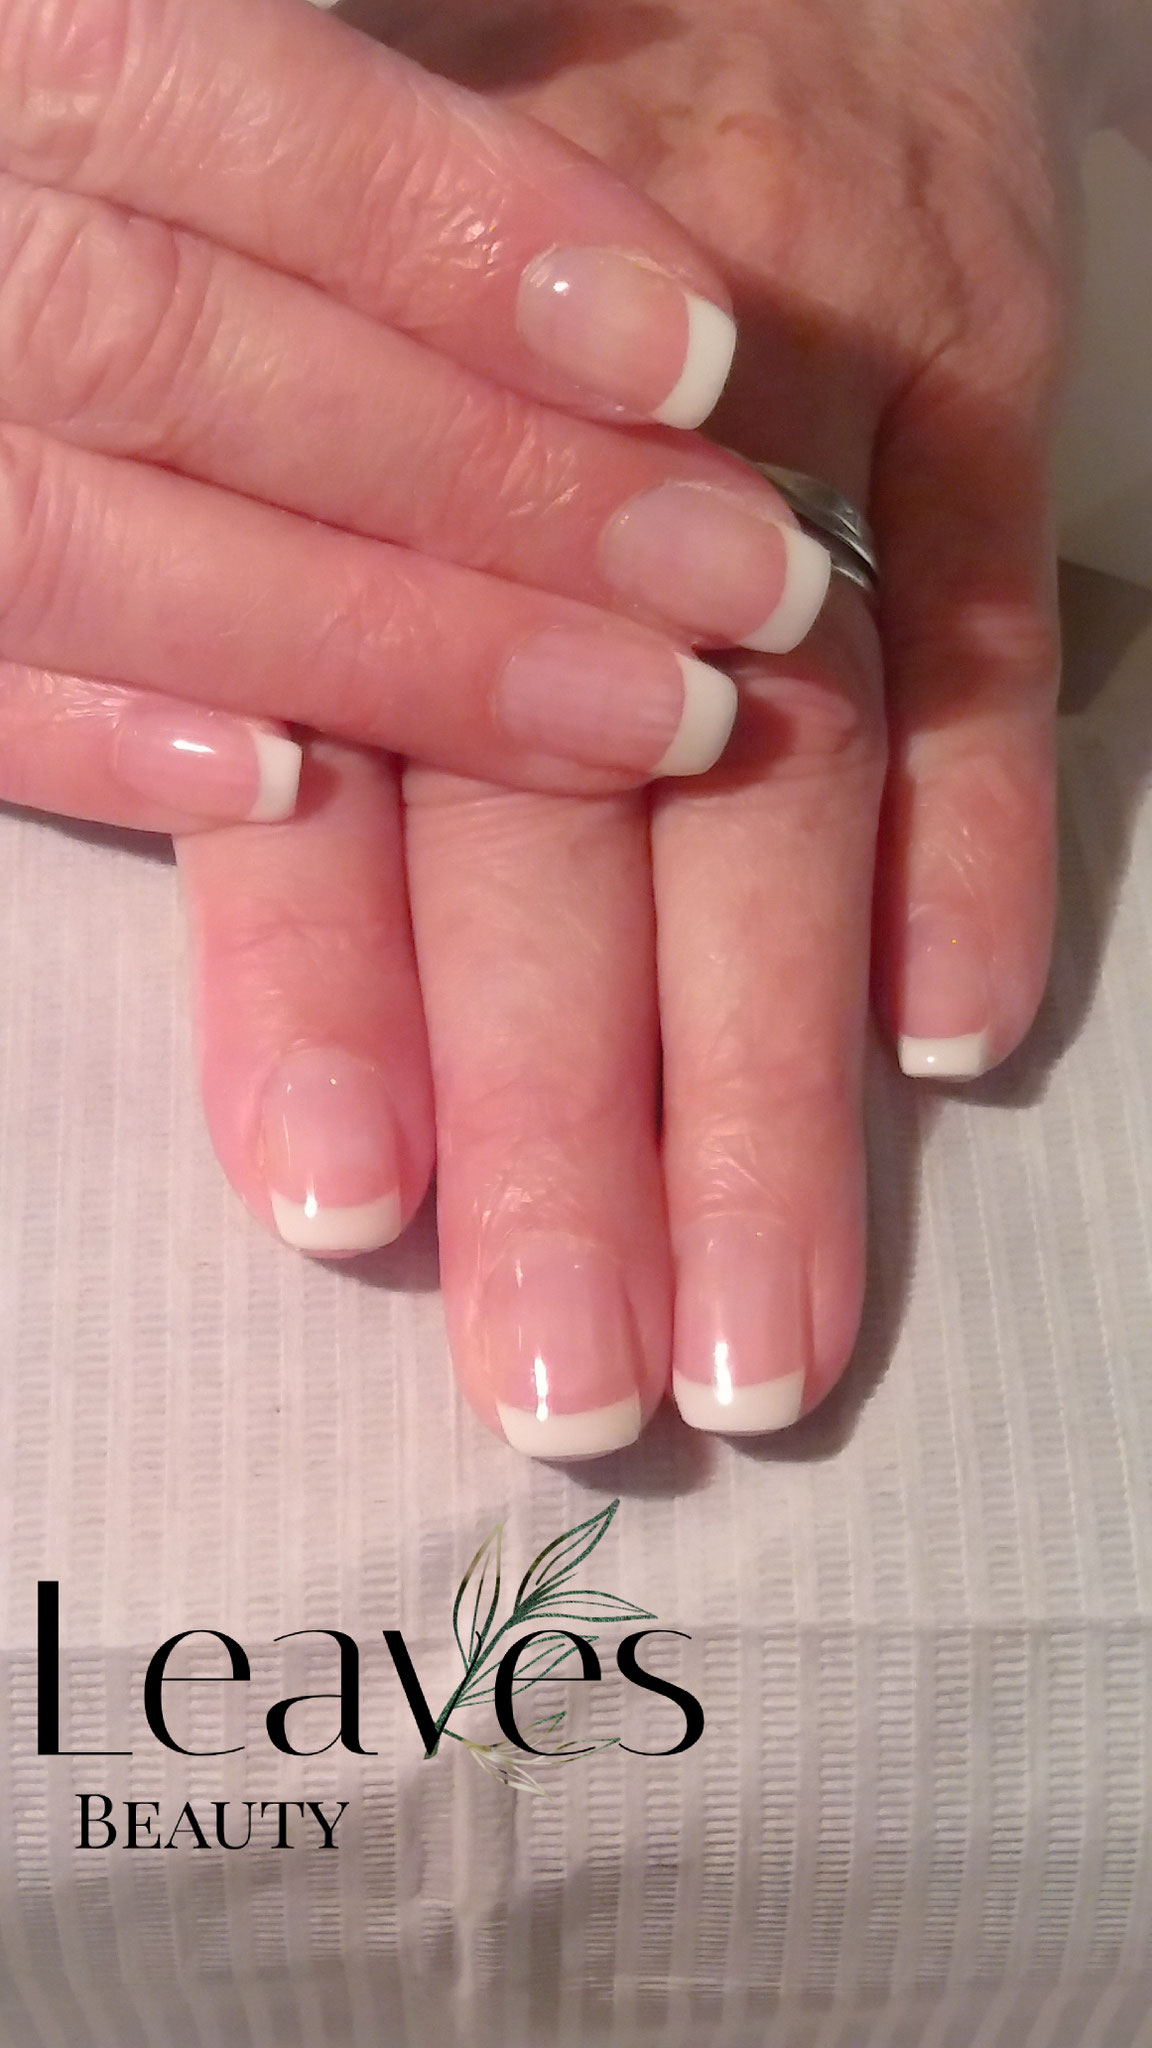 French manicure met gellak